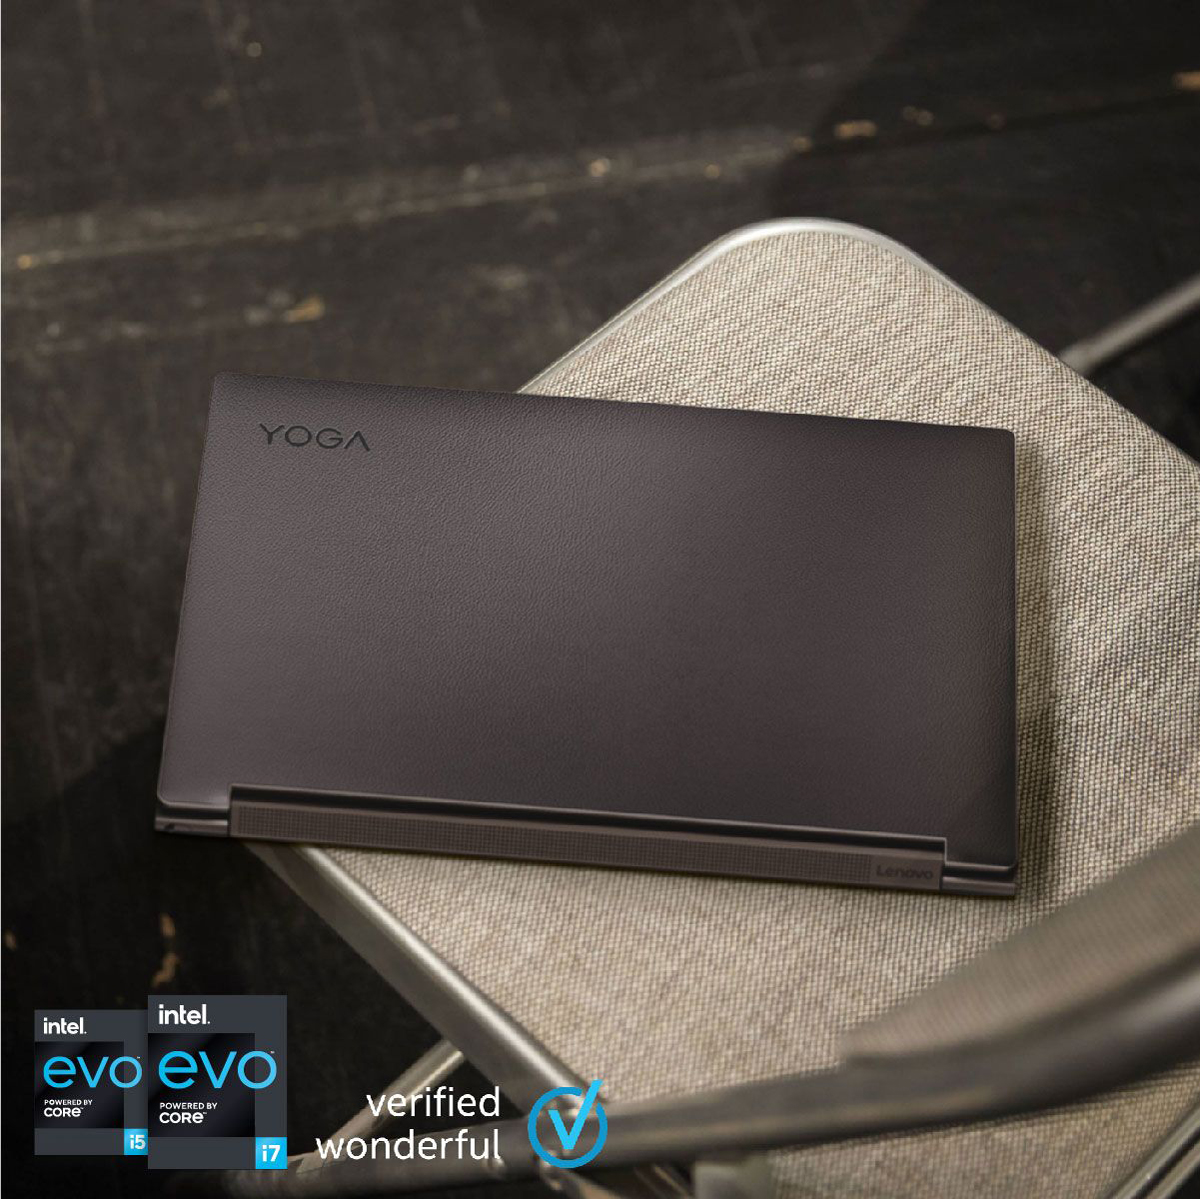 Lenovo Yoga 9i 14 Intel Evo